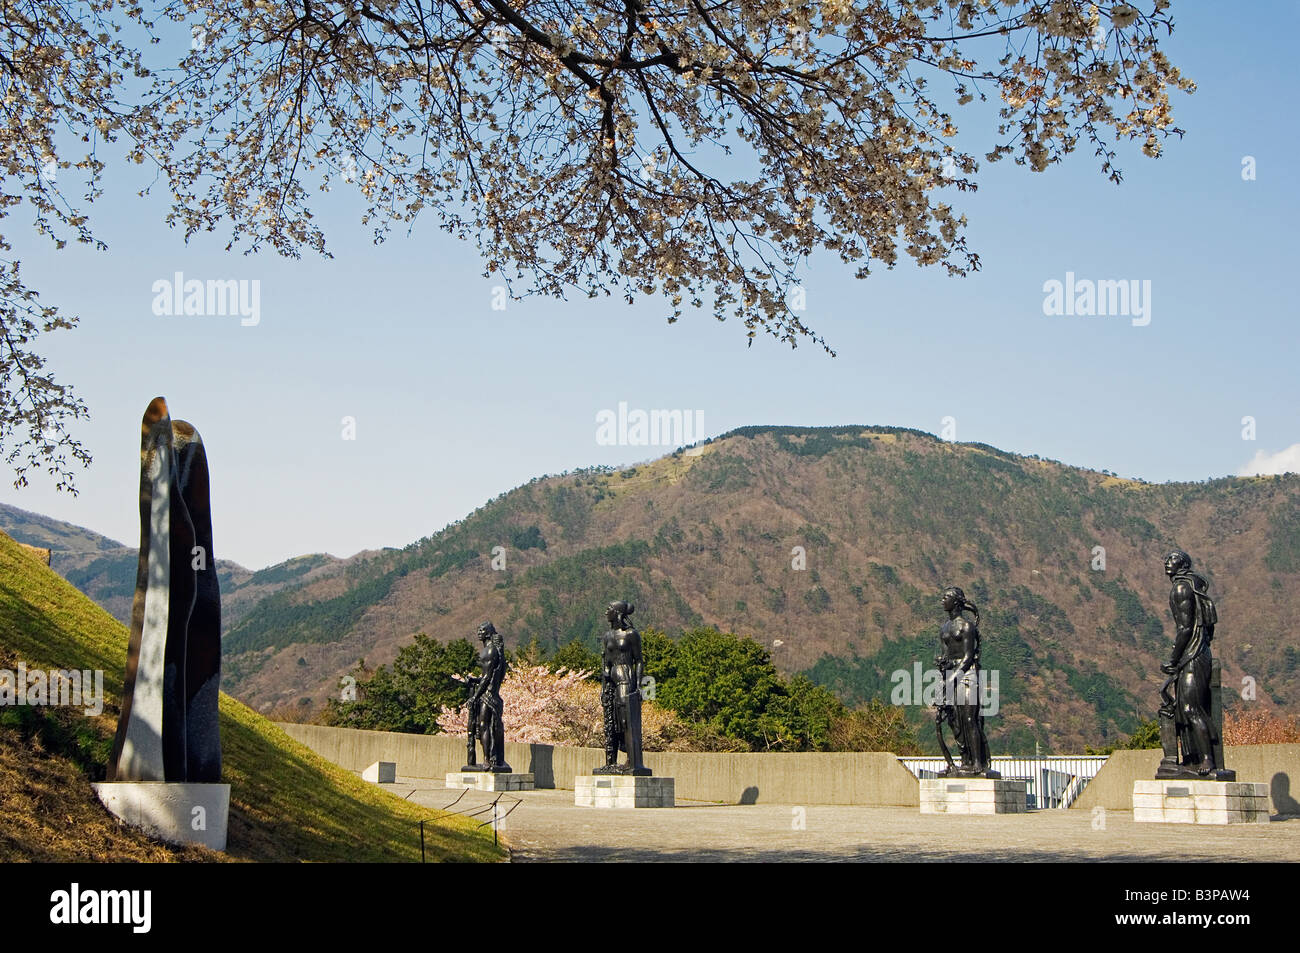 Japan, Kanagawa Prefecture, Hakone. Modern sculptures and art displays at Hakone Open Air Museum - Stock Image